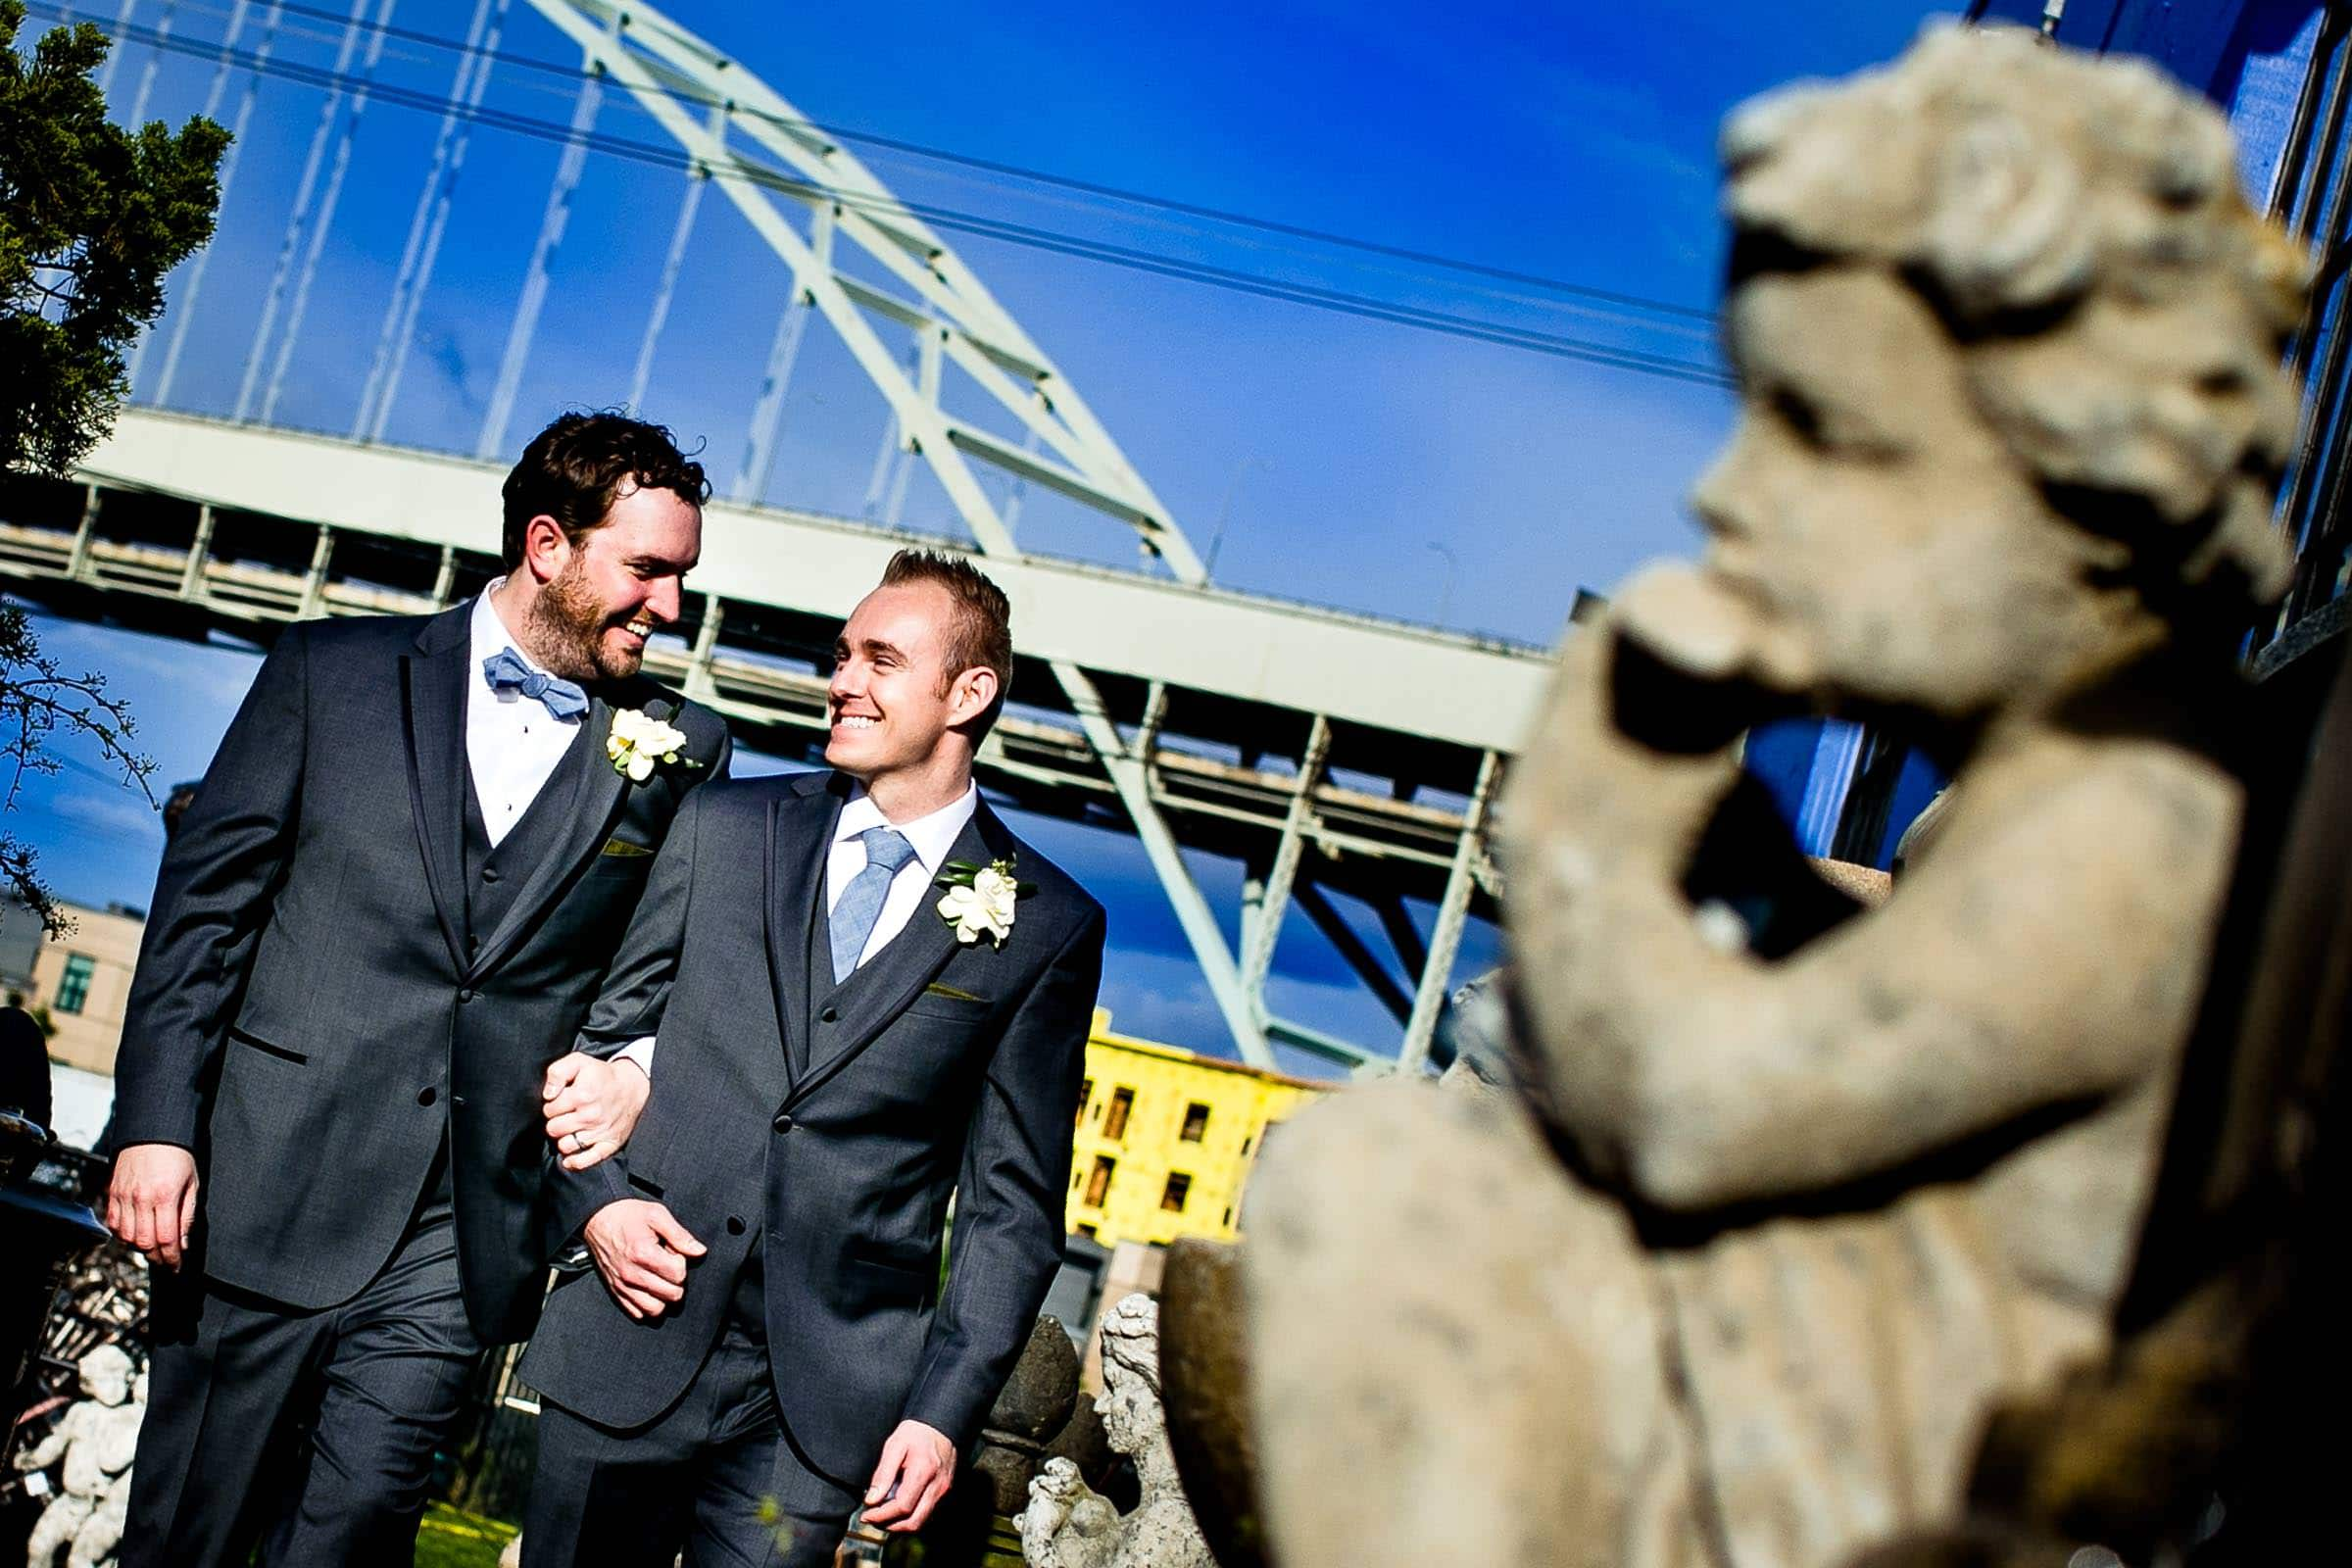 Grooms walking into their Castaway Portland wedding ceremony